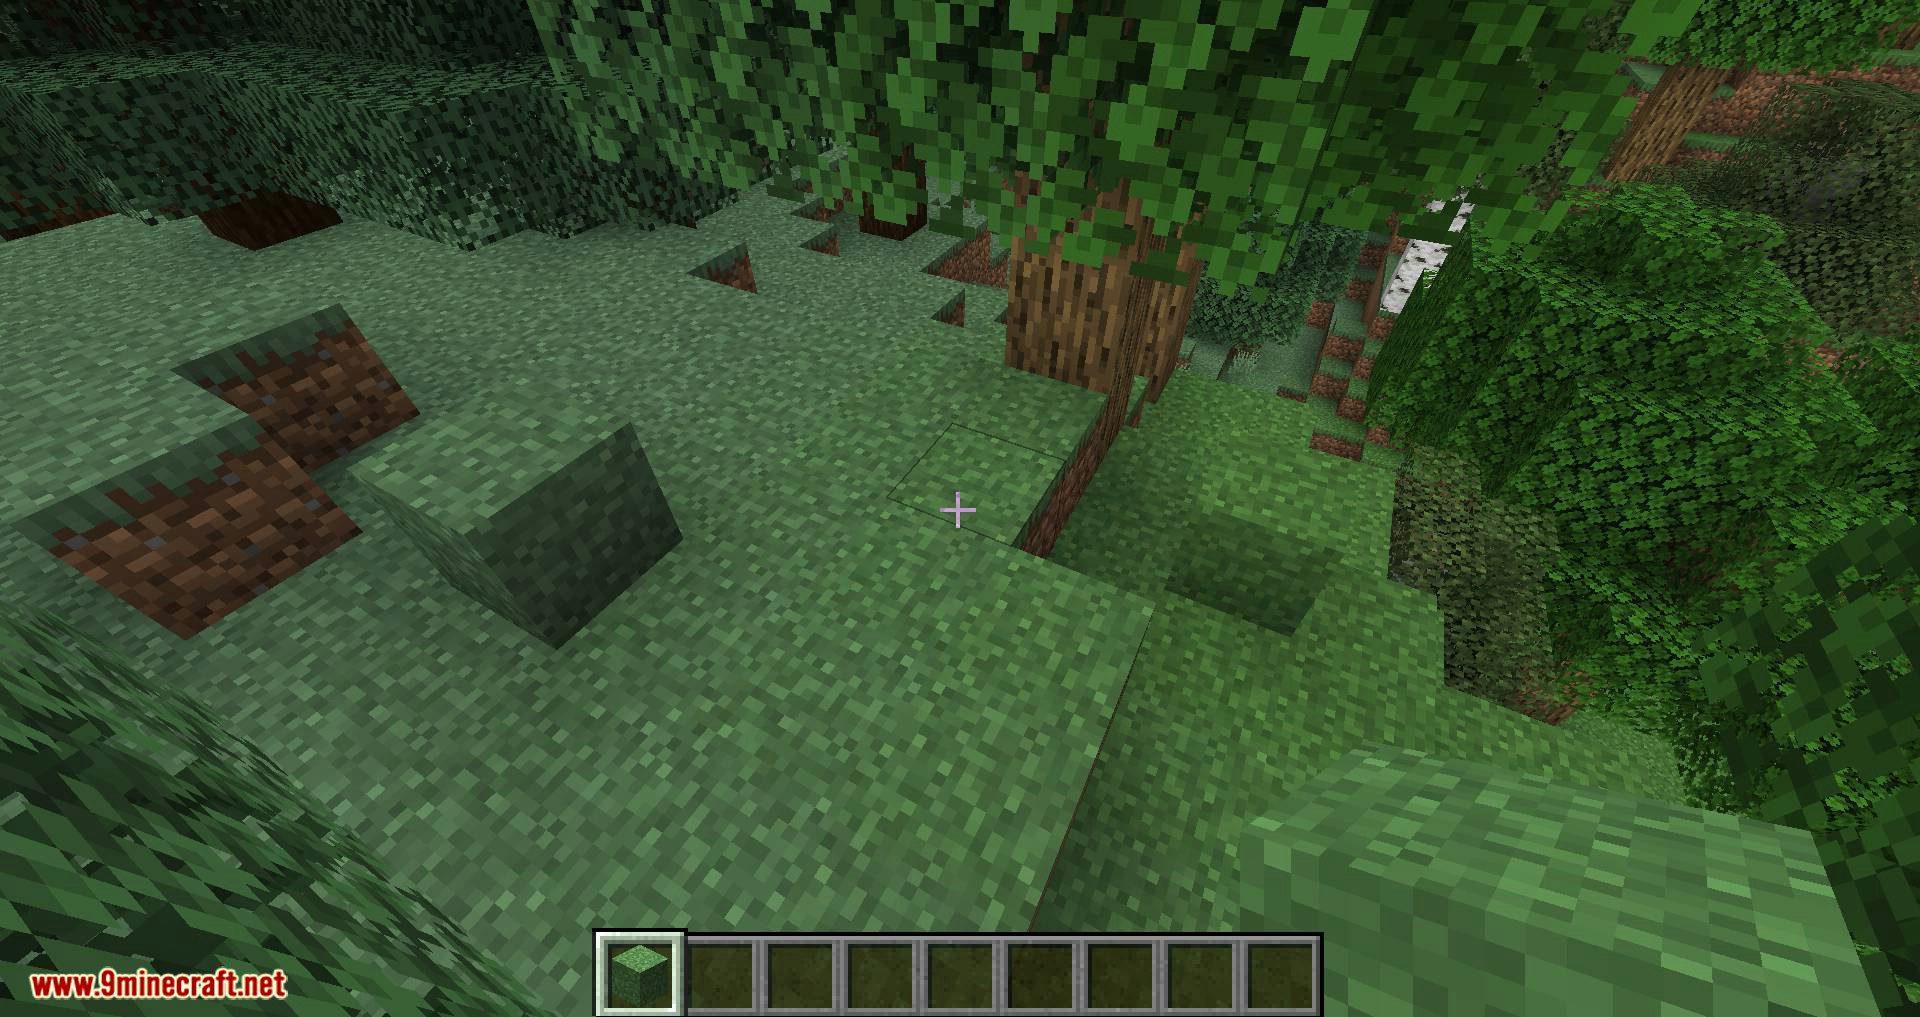 Turf mod for minecraft 10